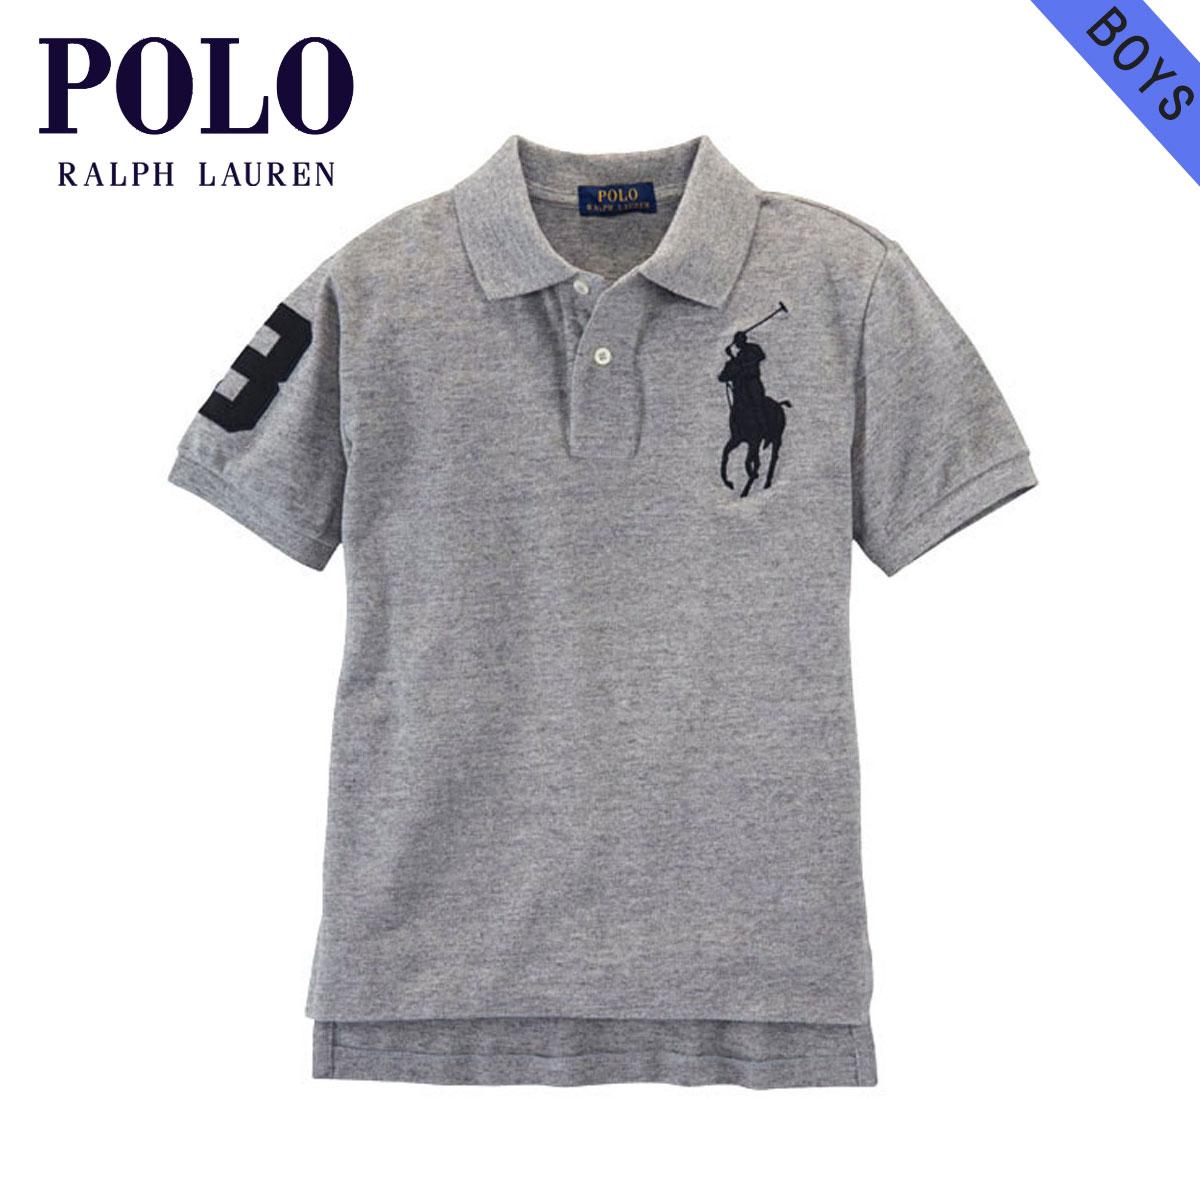 c7cd0a5534479 Polo Ralph Lauren kids POLO RALPH LAUREN CHILDREN regular article children s  clothes boys polo shirt BIG PONY COTTON POLO SHIRT 65353776 D00S15